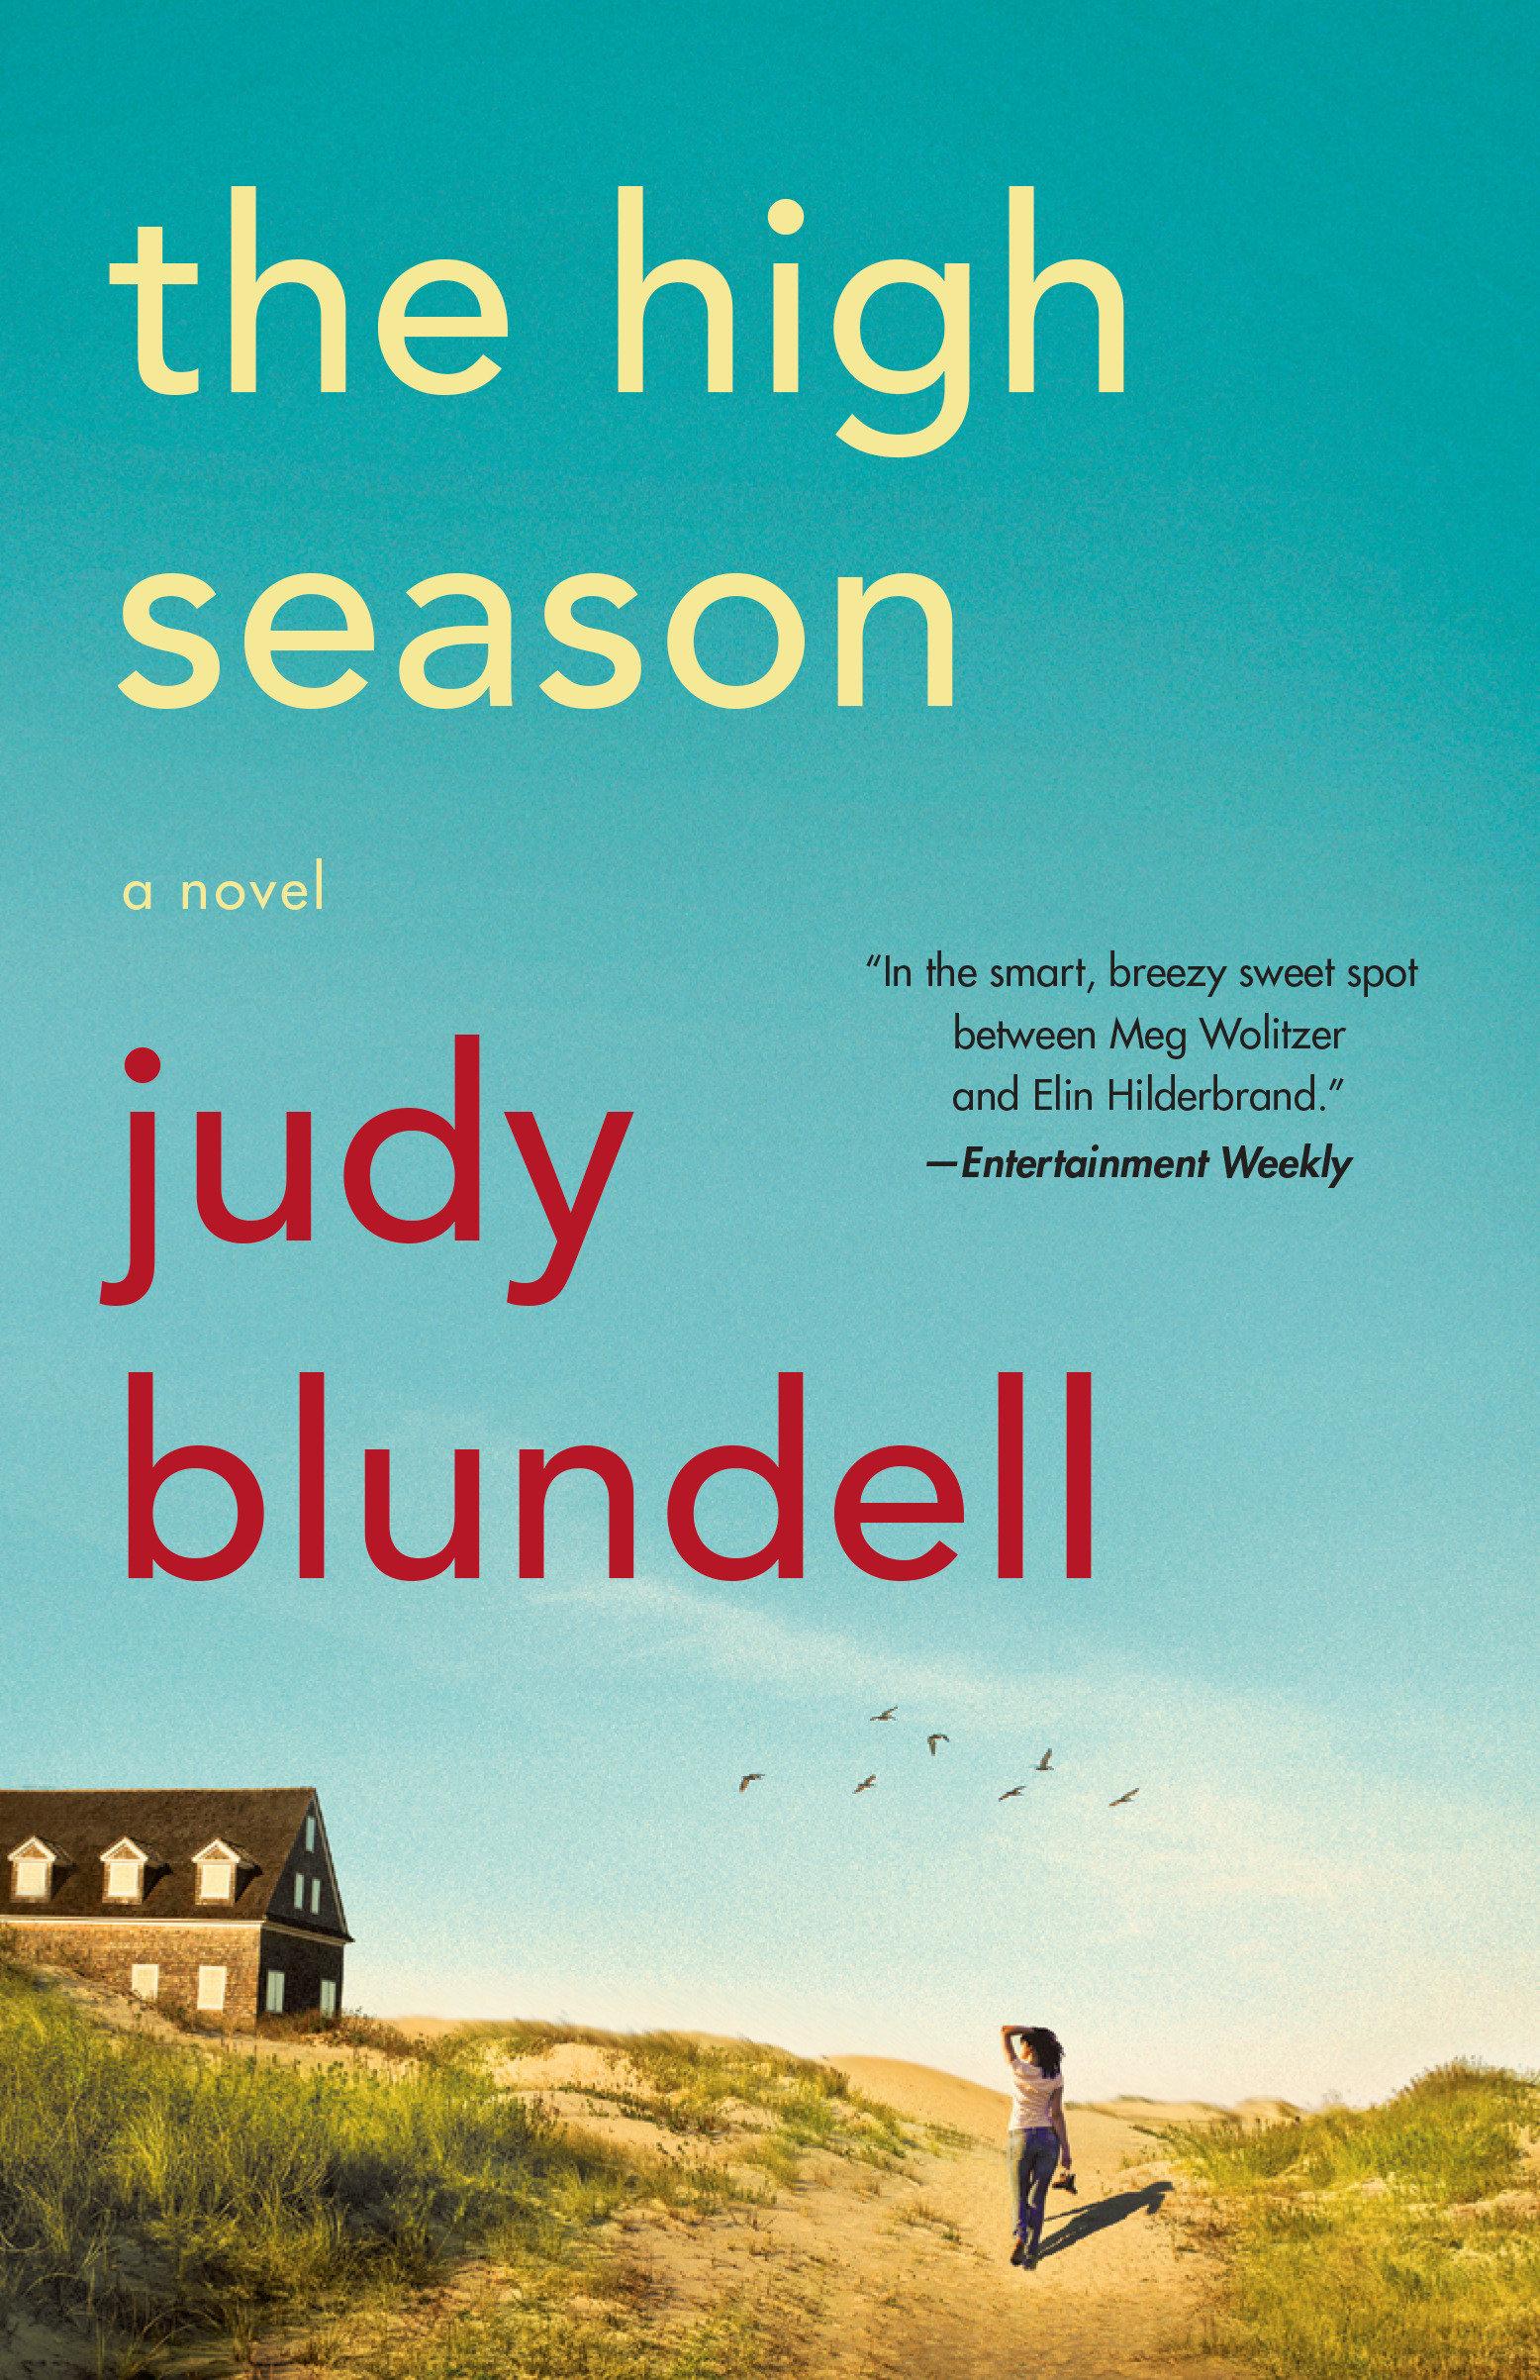 The high season cover image